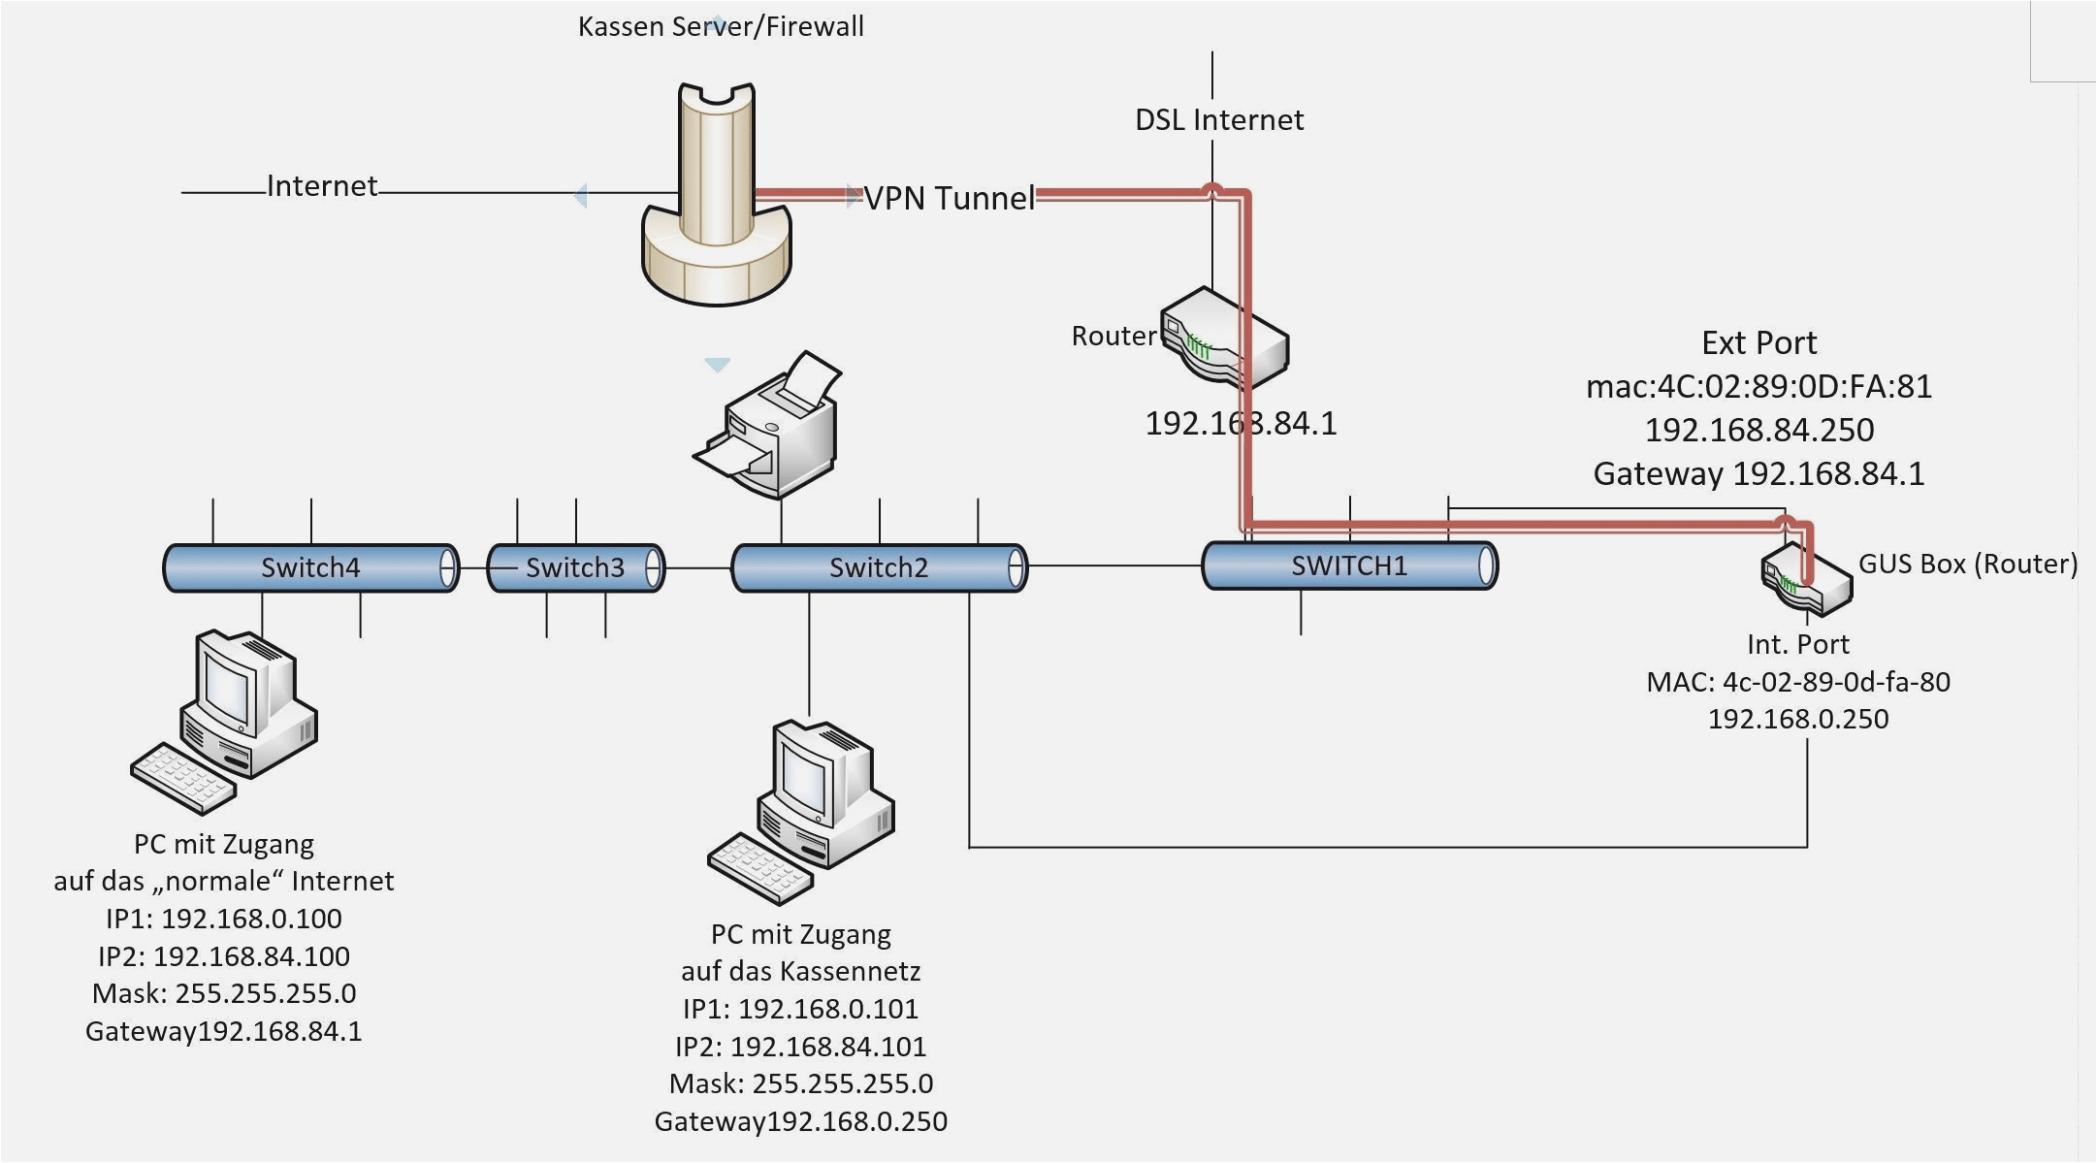 wiring diagrams free download further 65 mustang heater fan diagram wiring diagrams free download further 65 mustang heater fan diagram